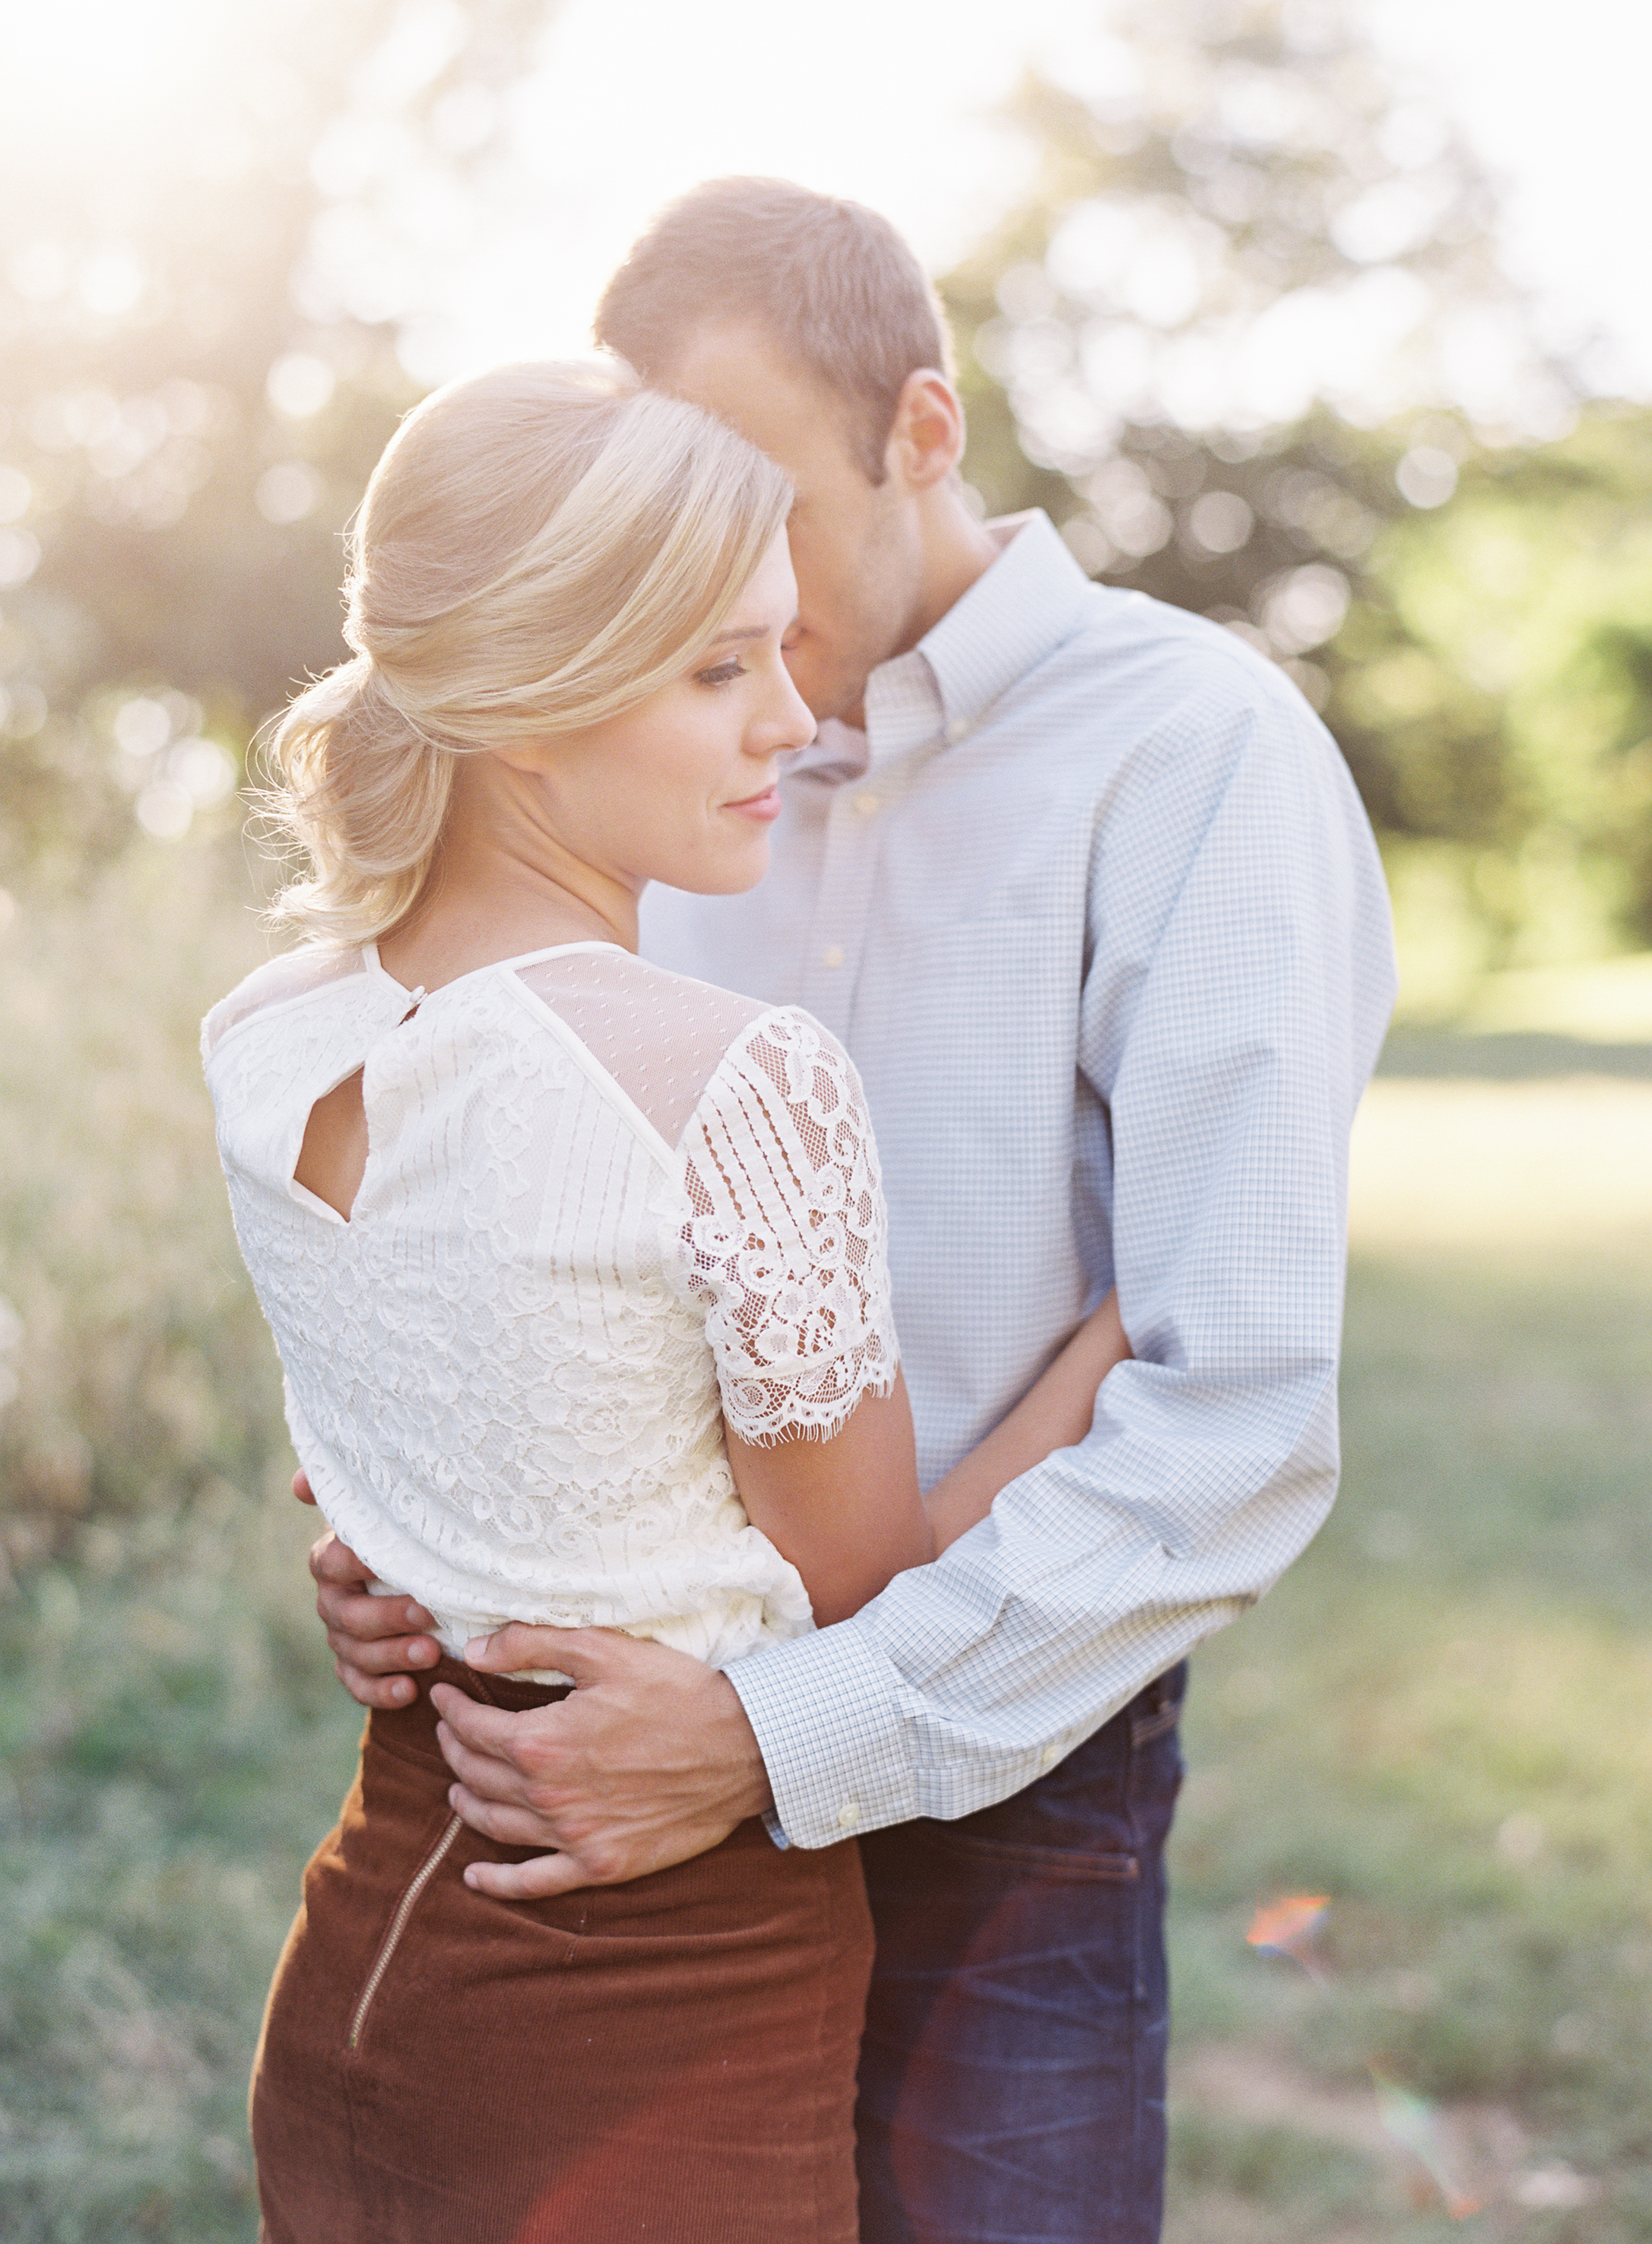 Meghan Mehan Photography | Fine Art Film Wedding Photographer | California | San Francisco | Napa | Sonoma | Santa Barbara | Big Sur | Los Angeles | Destination Wedding Photographer 012.jpg